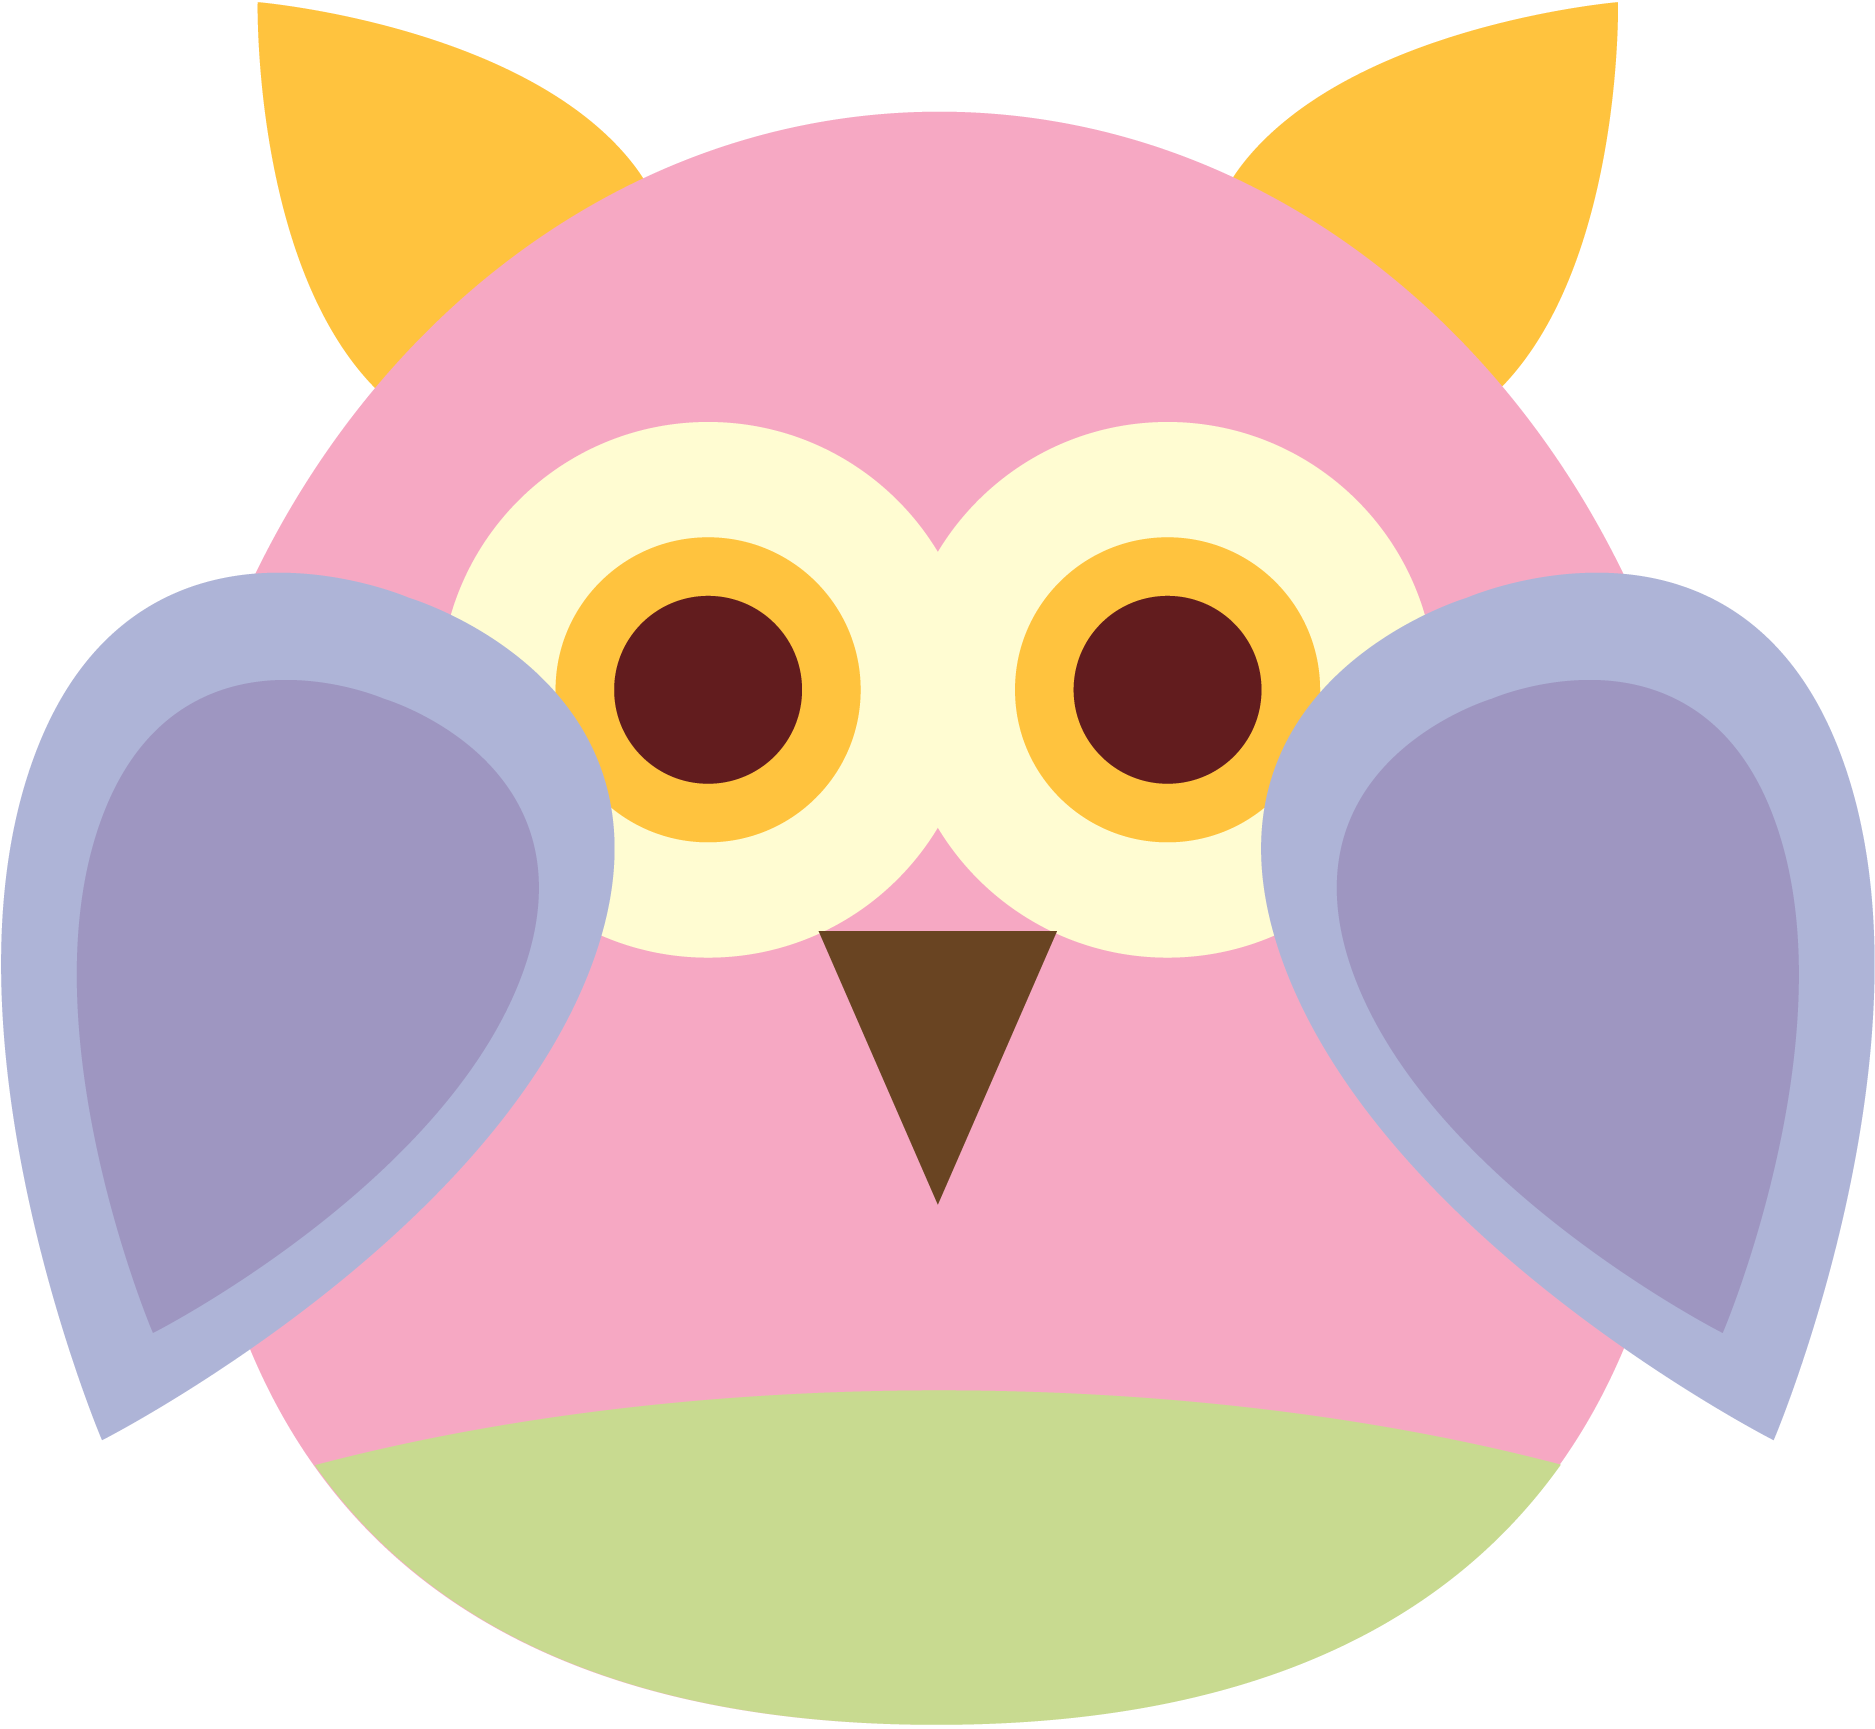 Free Cute Owl Clipart, Download Free Clip Art, Free Clip Art.